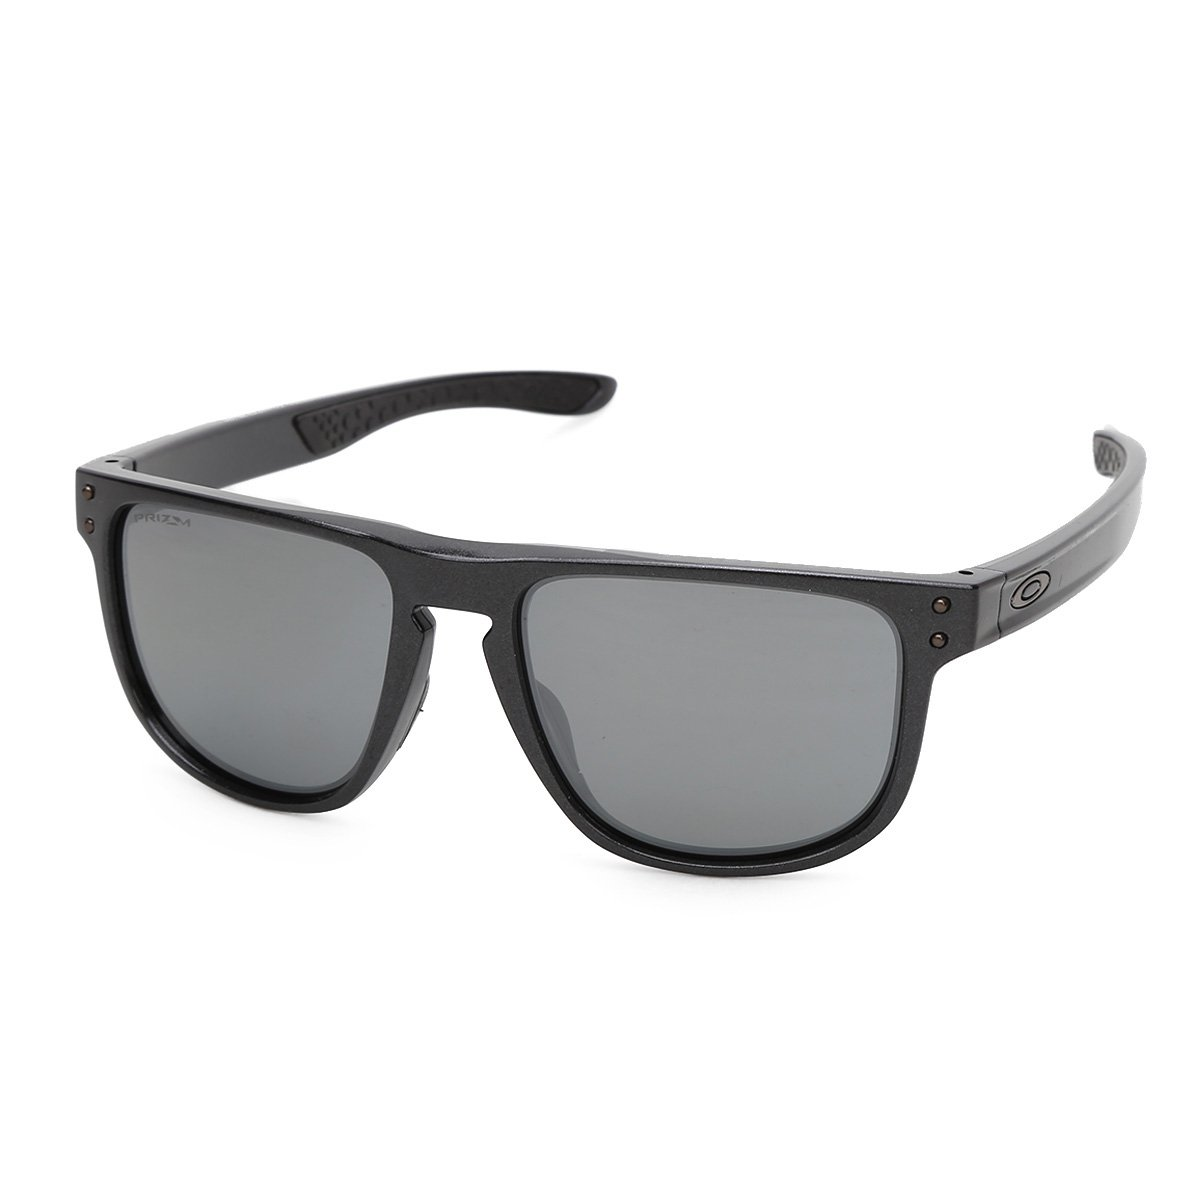 31087ae4e Óculos Oakley Holbrook R Prizm Masculino